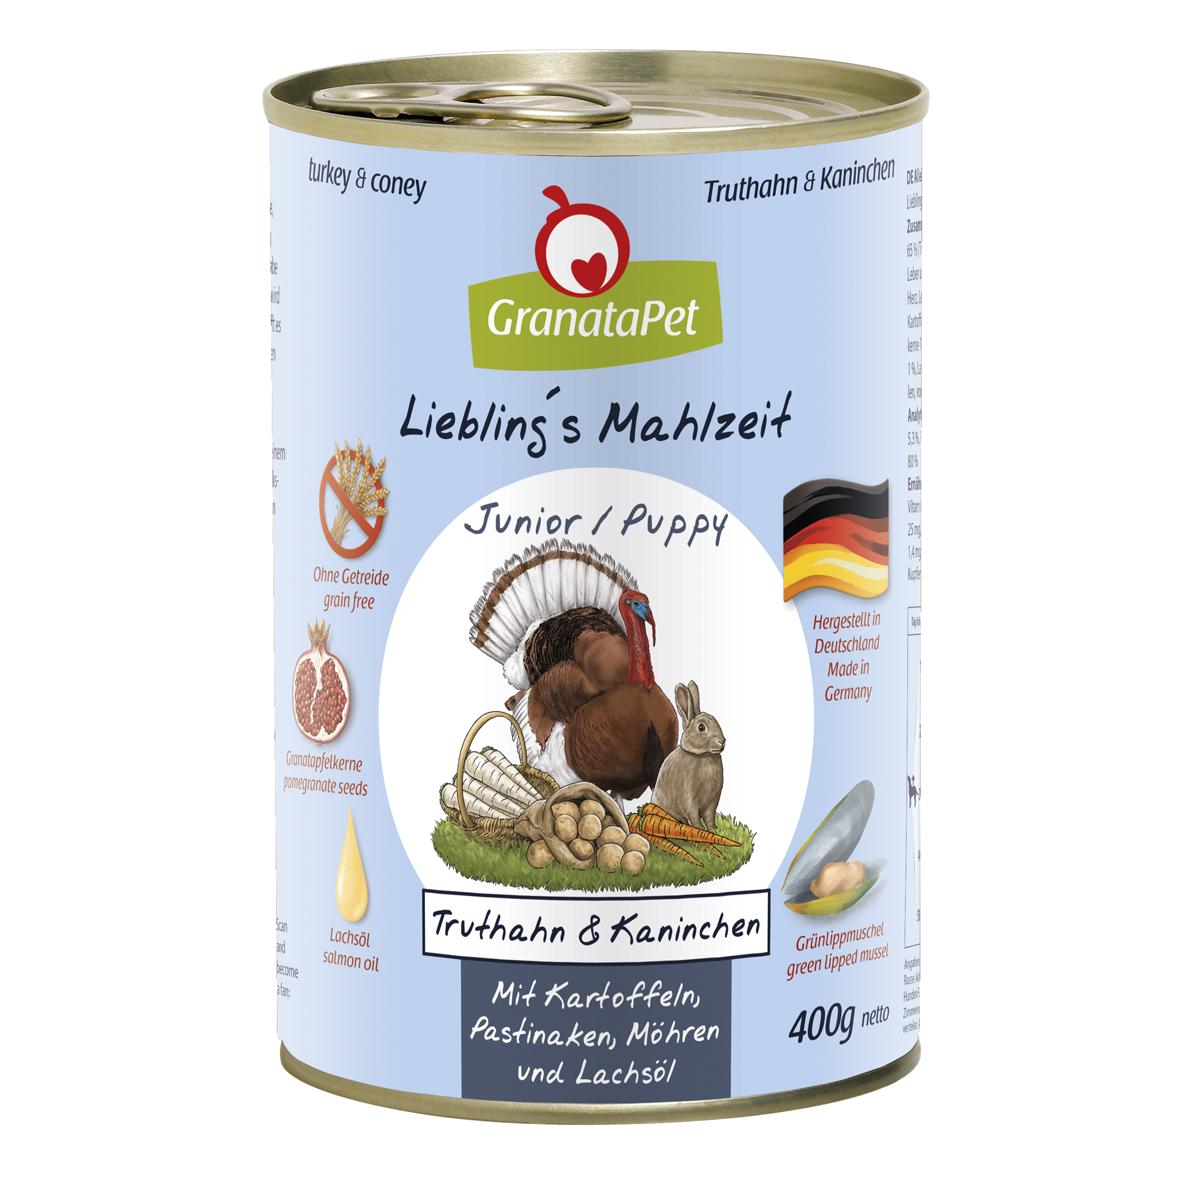 GranataPet Liebling's Mahlzeit Puppy